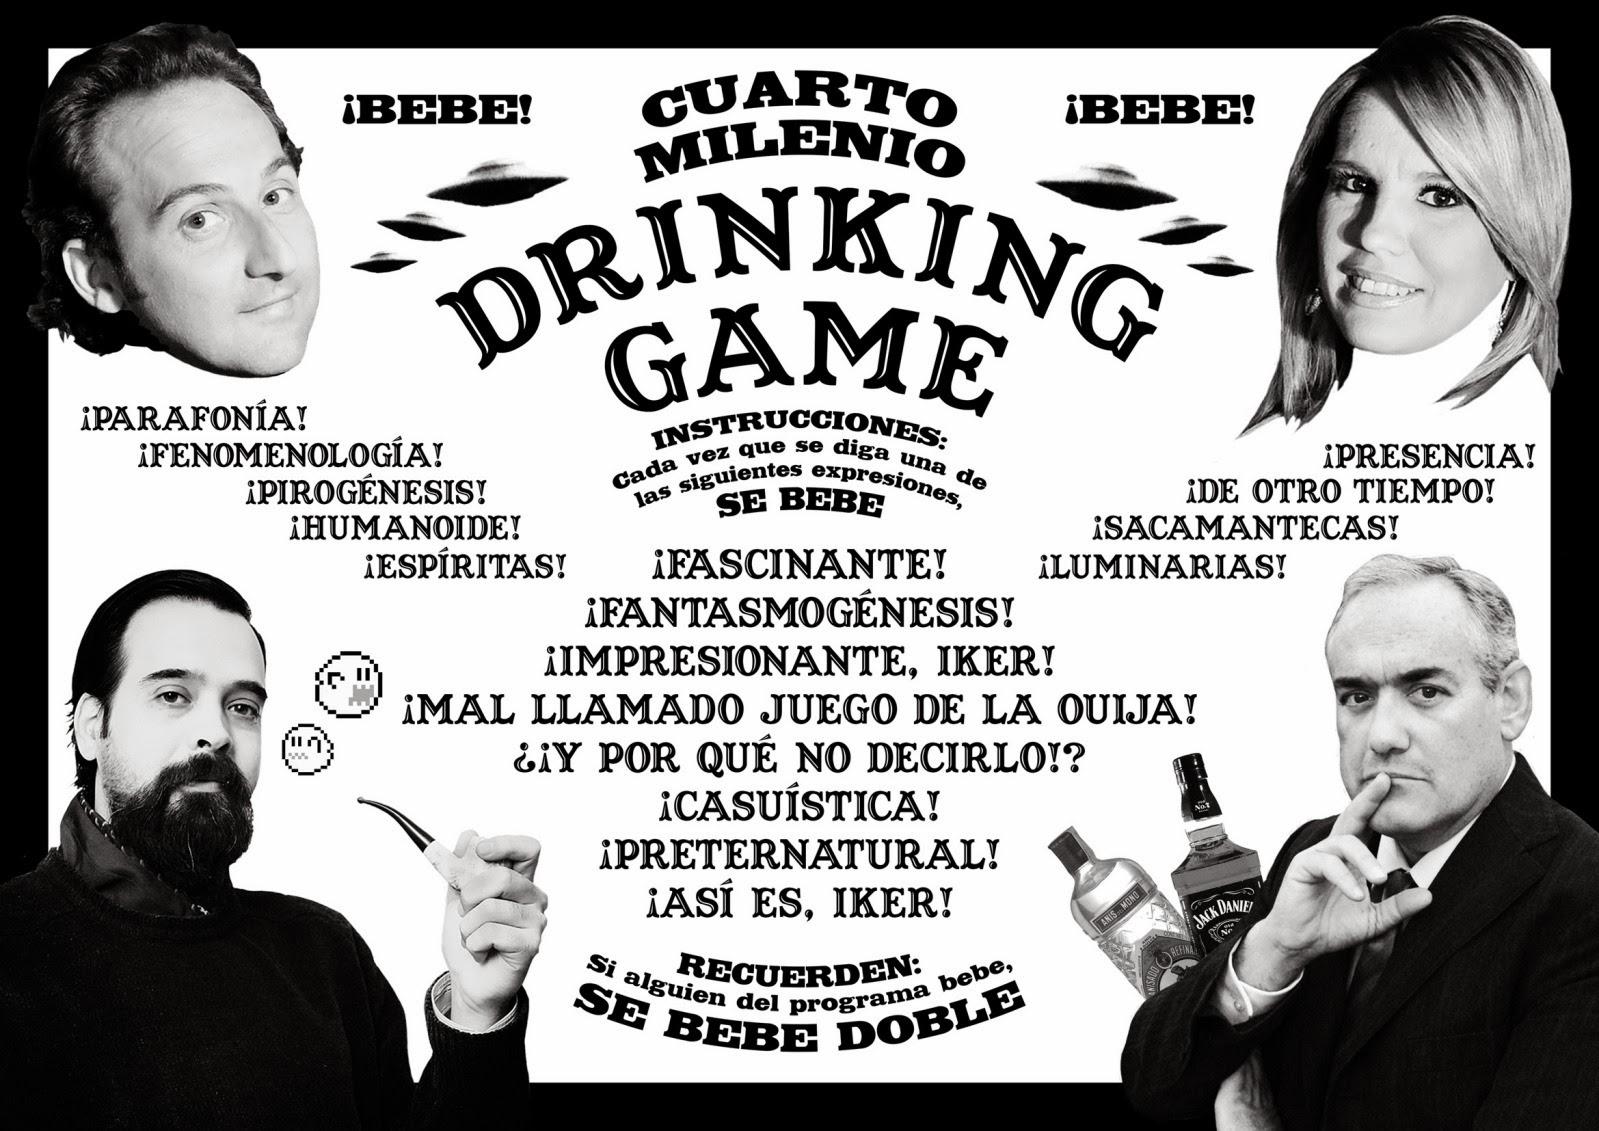 mihteriohdelasiensia: \'Cuarto milenio drinking game\'